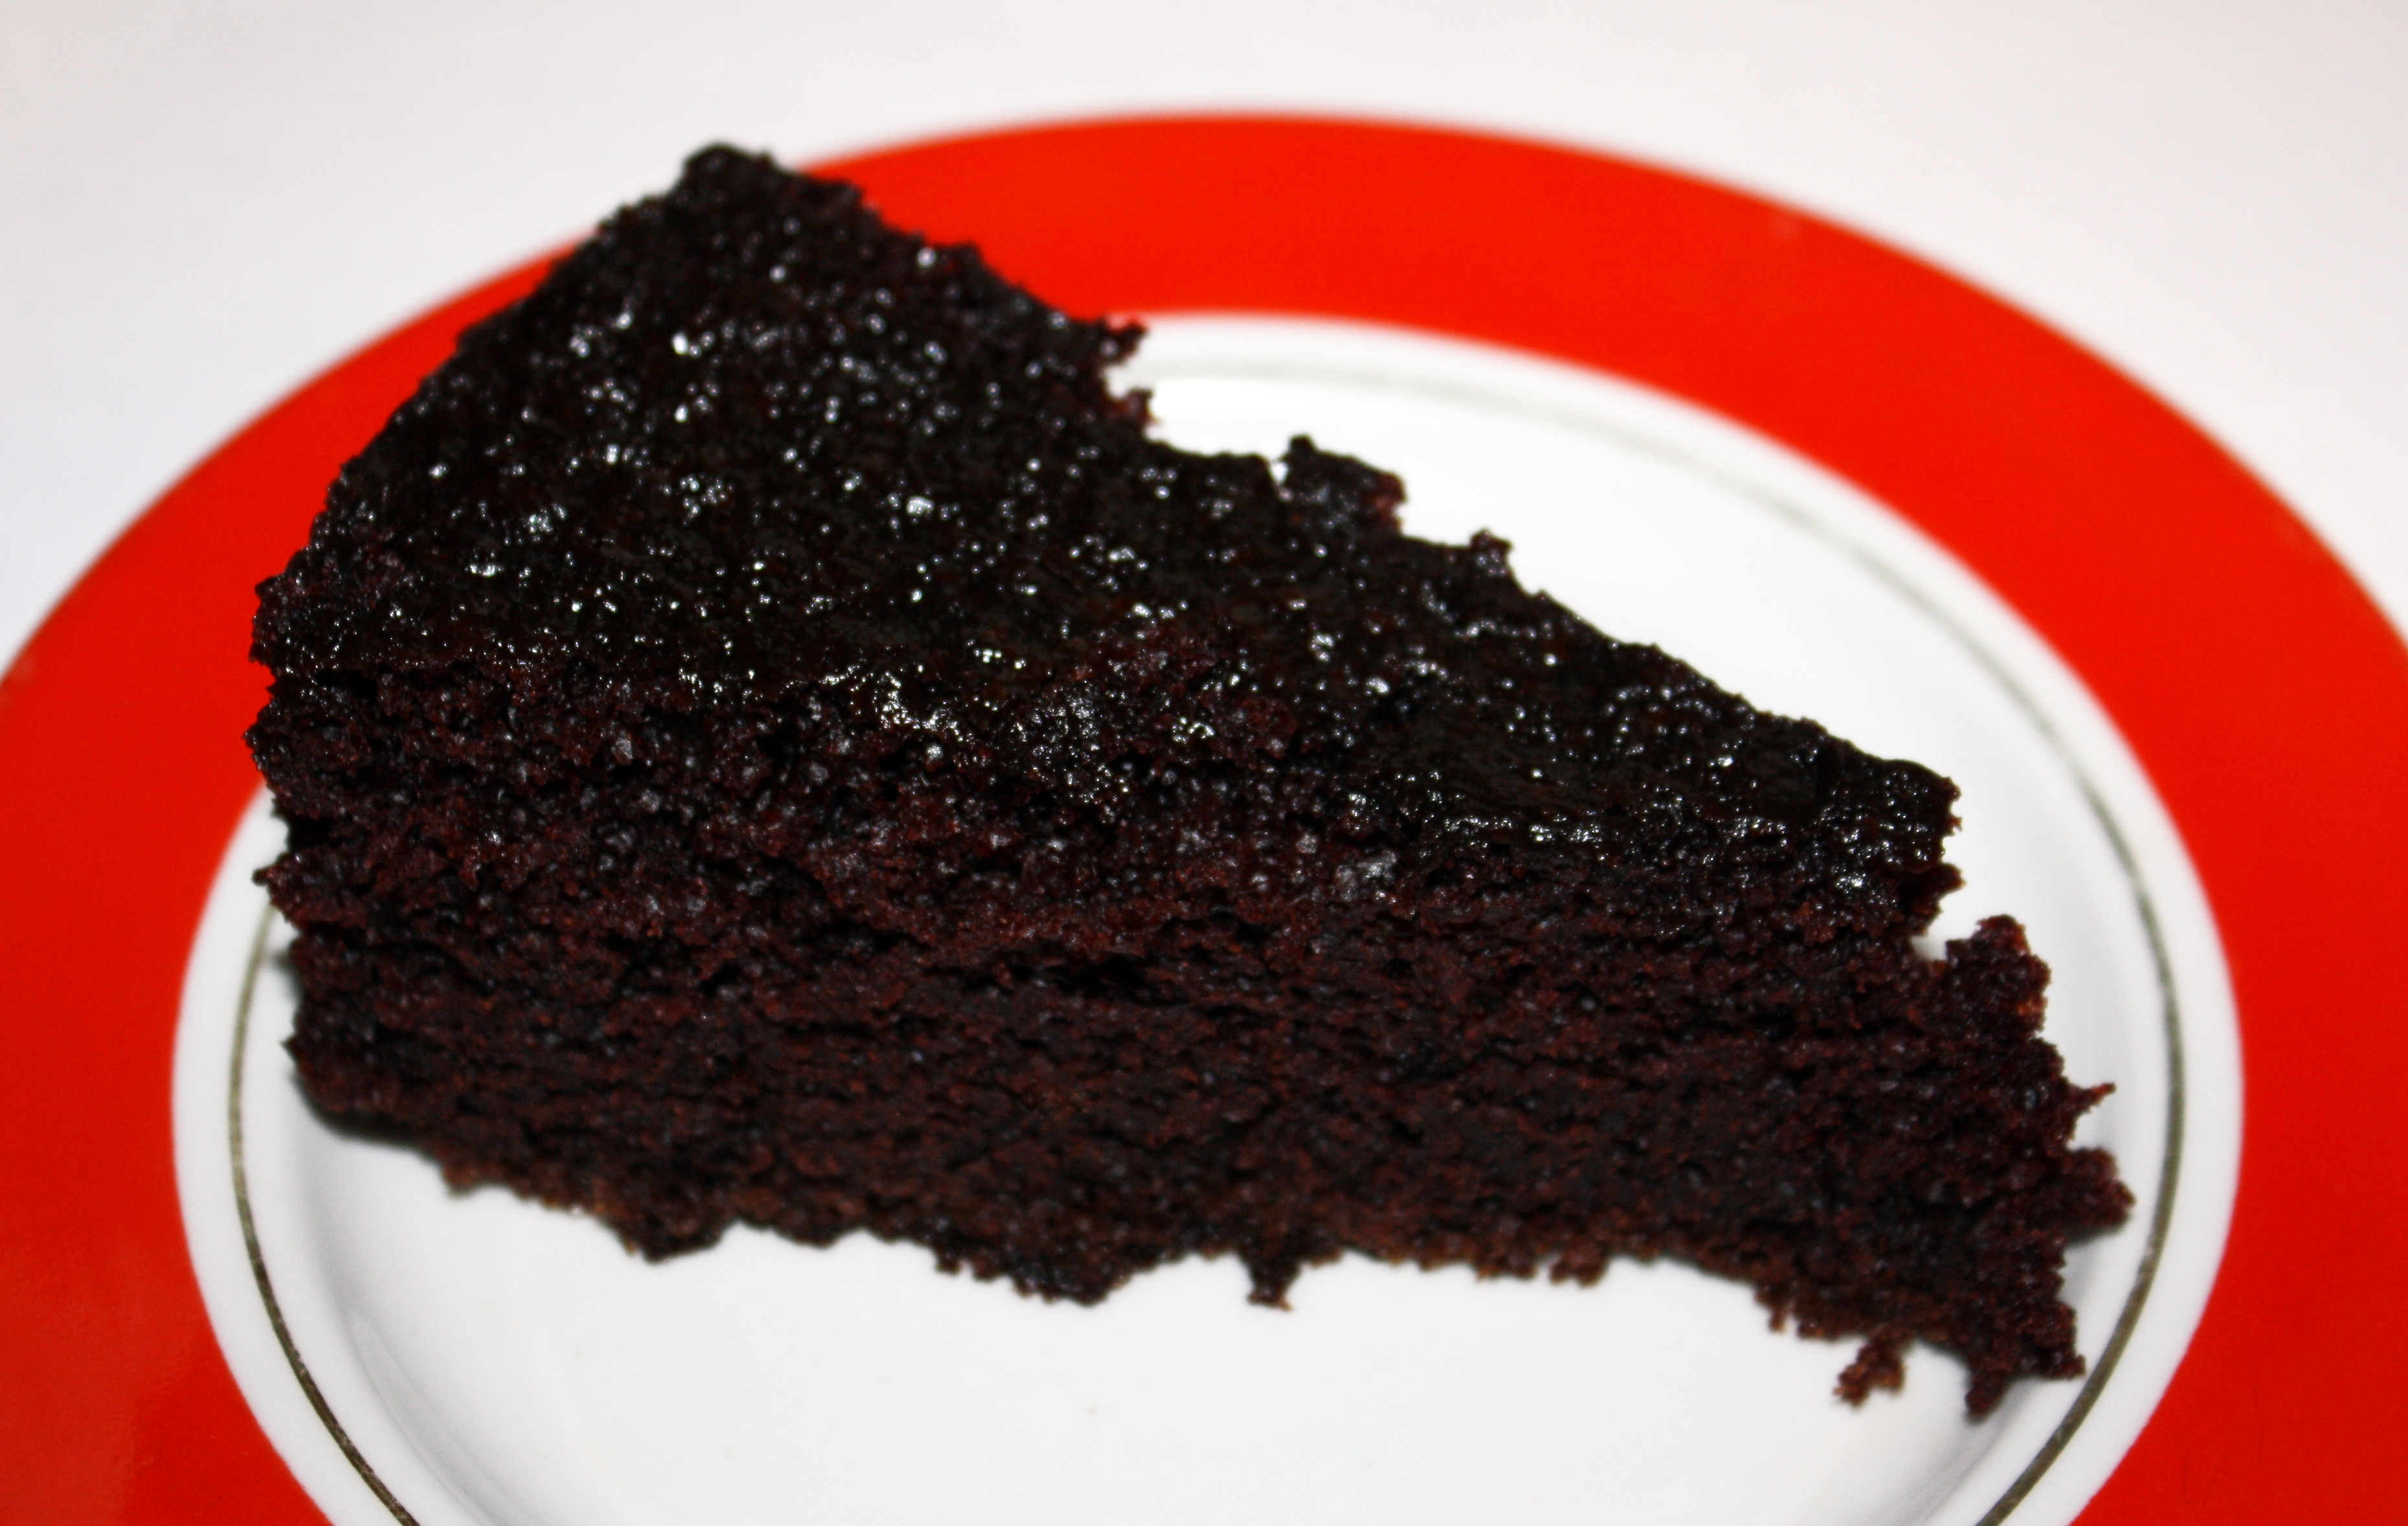 dark chocolate cake for dark, cold days | procrasticooking